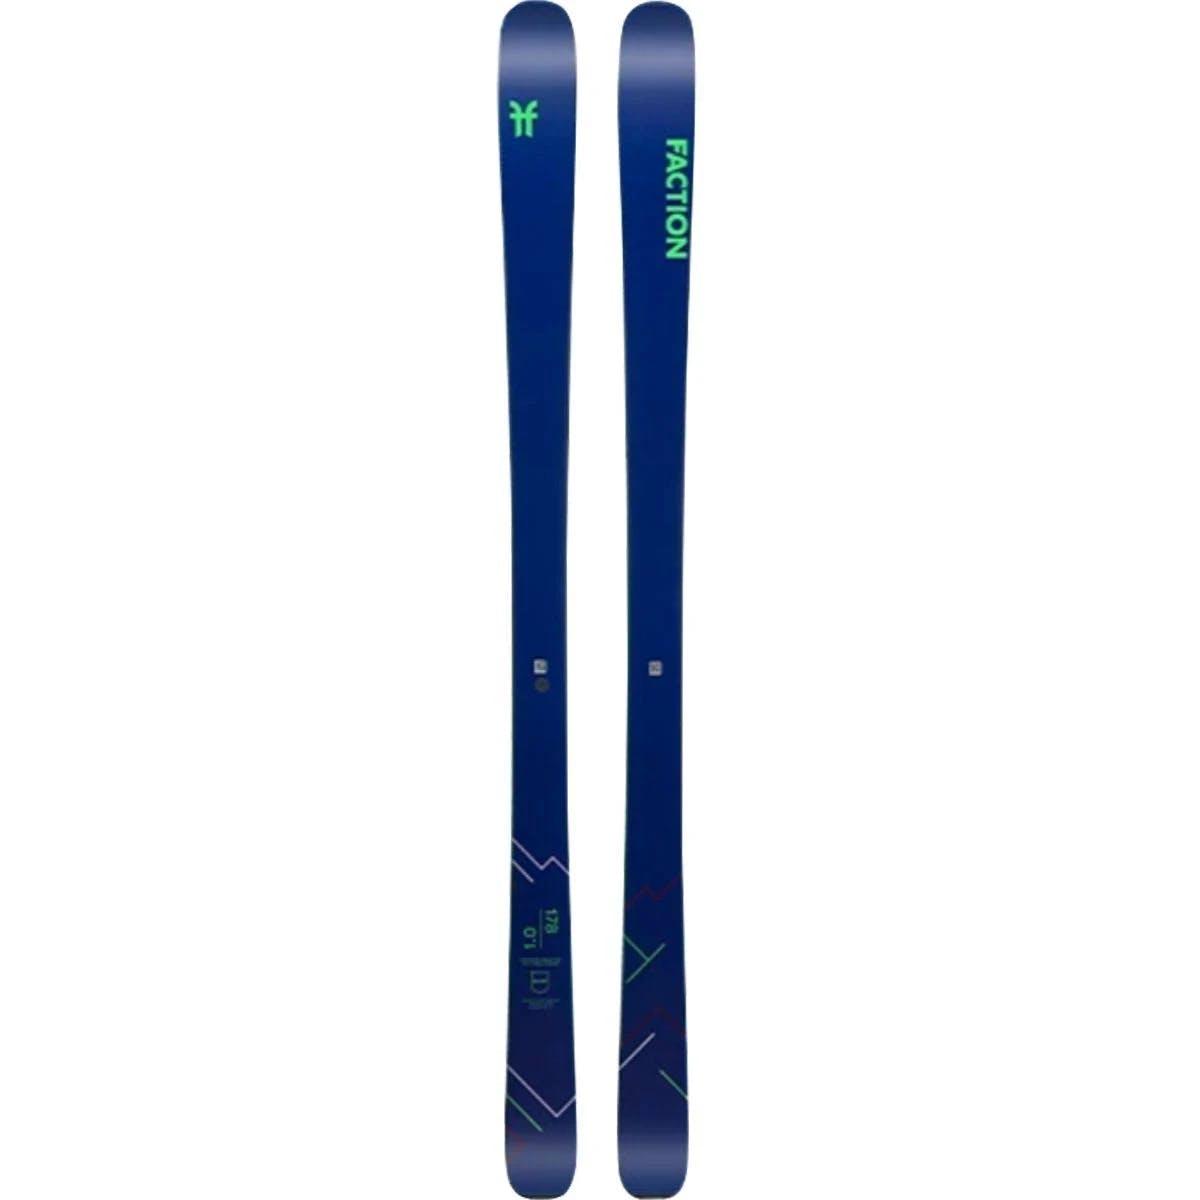 Faction Ski Agent 1.0 Skis